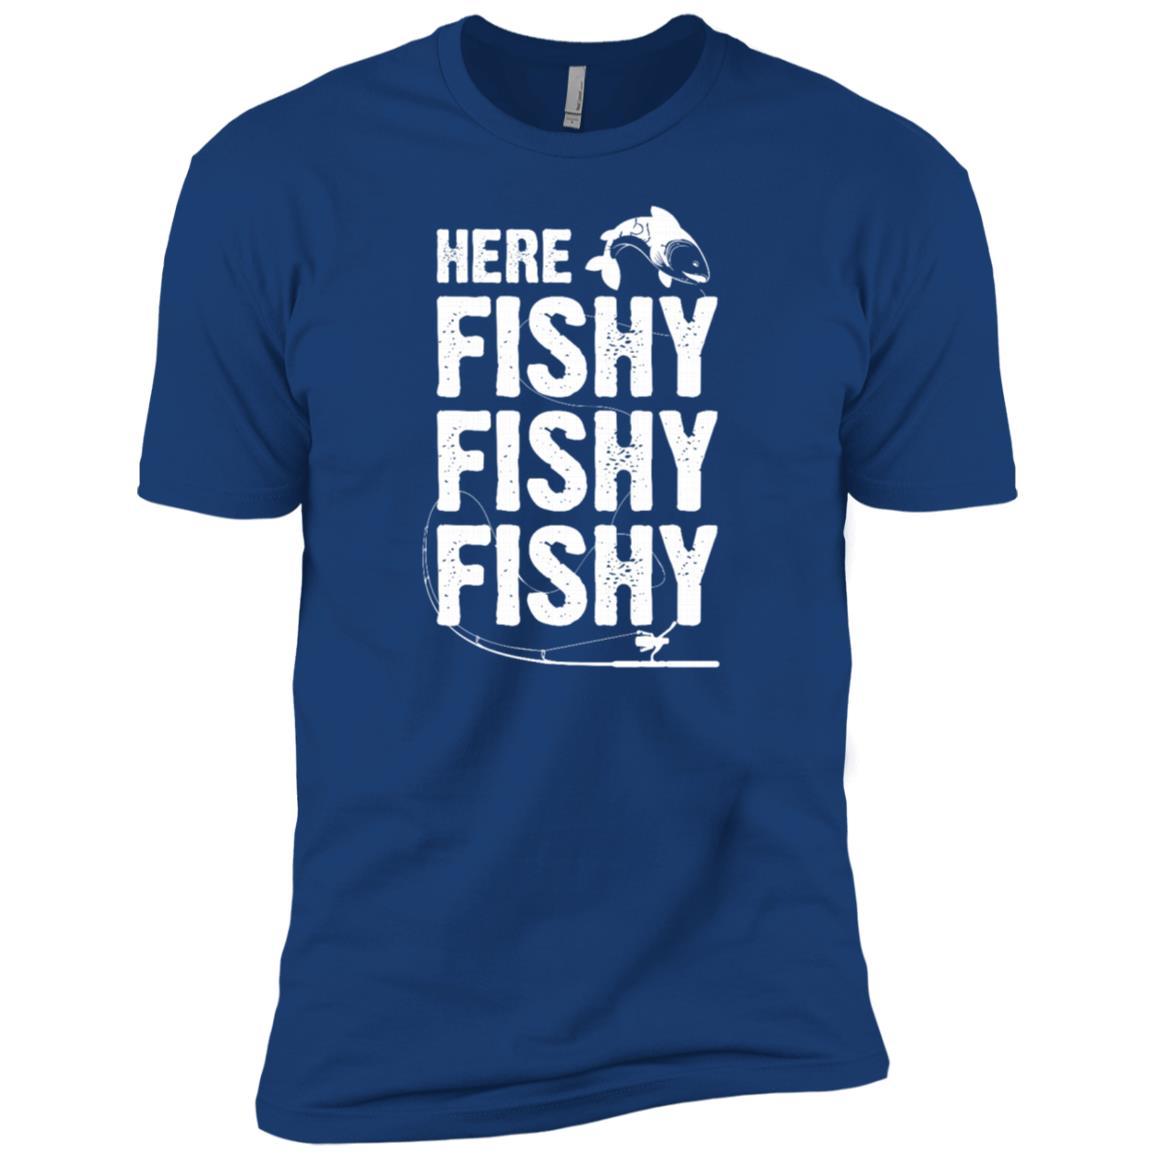 Funny Here Fishy Fishy Fishy Fisherman -2 Men Short Sleeve T-Shirt